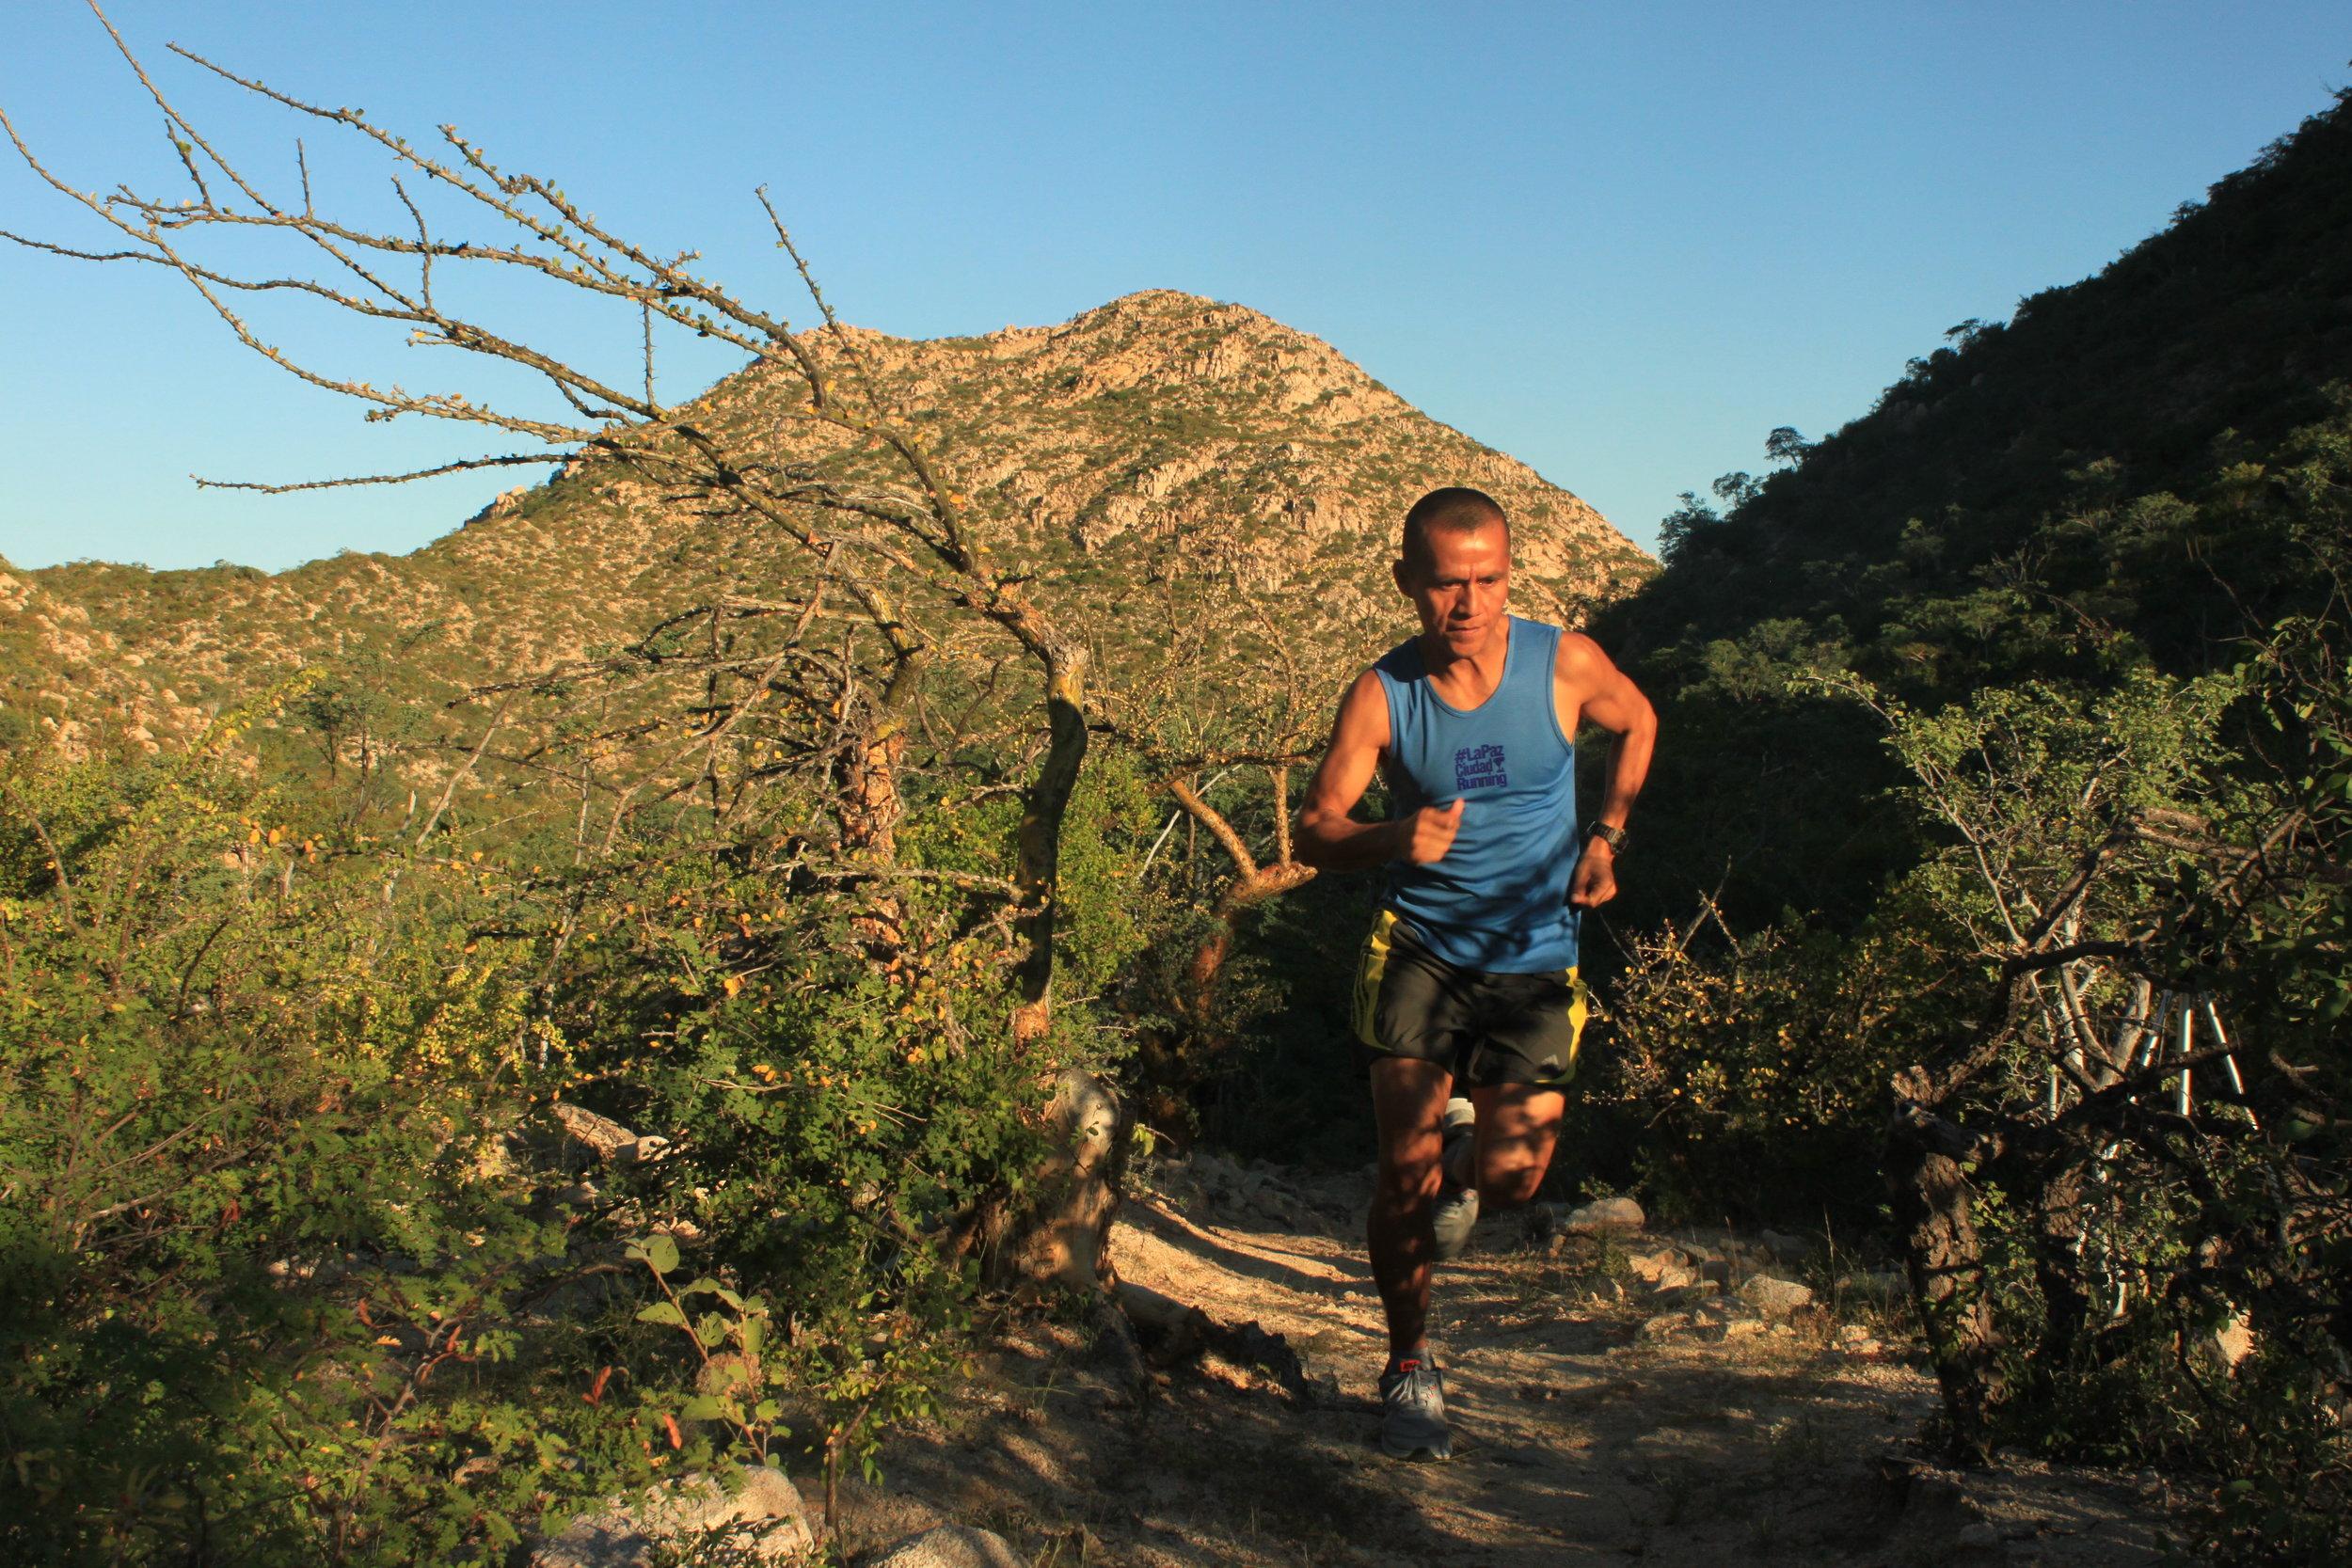 carrera-don-diablo-trail-run-la-paz-baja-california-sur.jpg